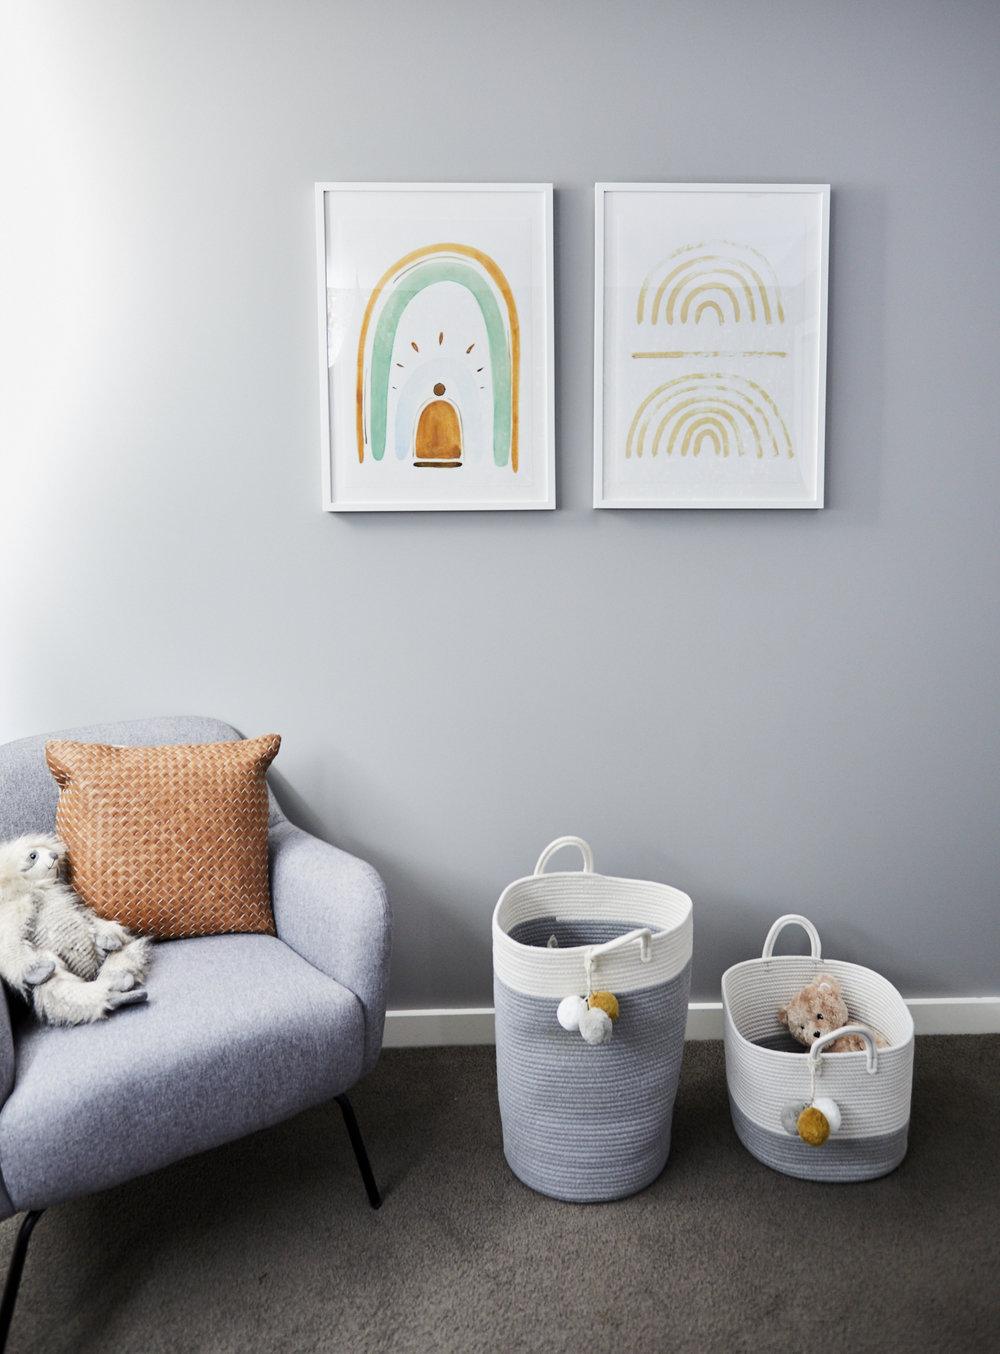 baby nursery_homeroom studio reveal_ grey and neutral armchair ad baskets